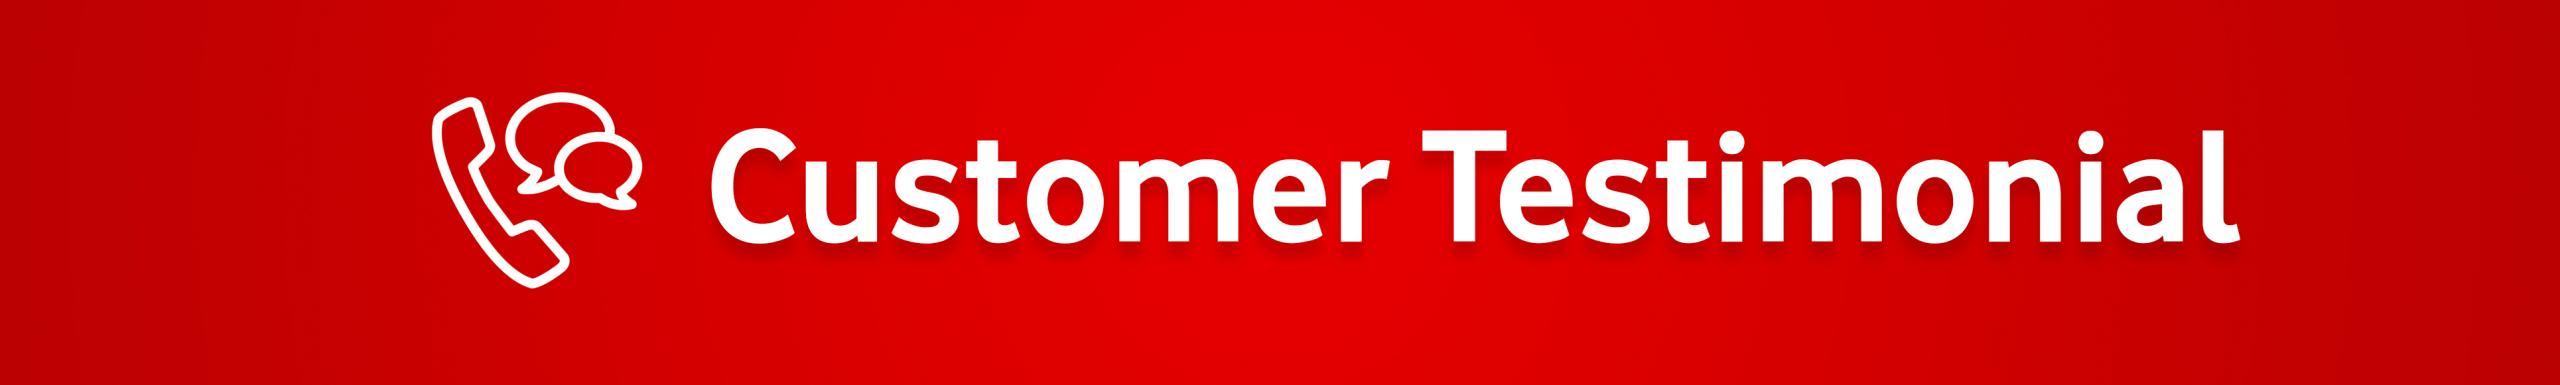 Customer Testimonials Banner